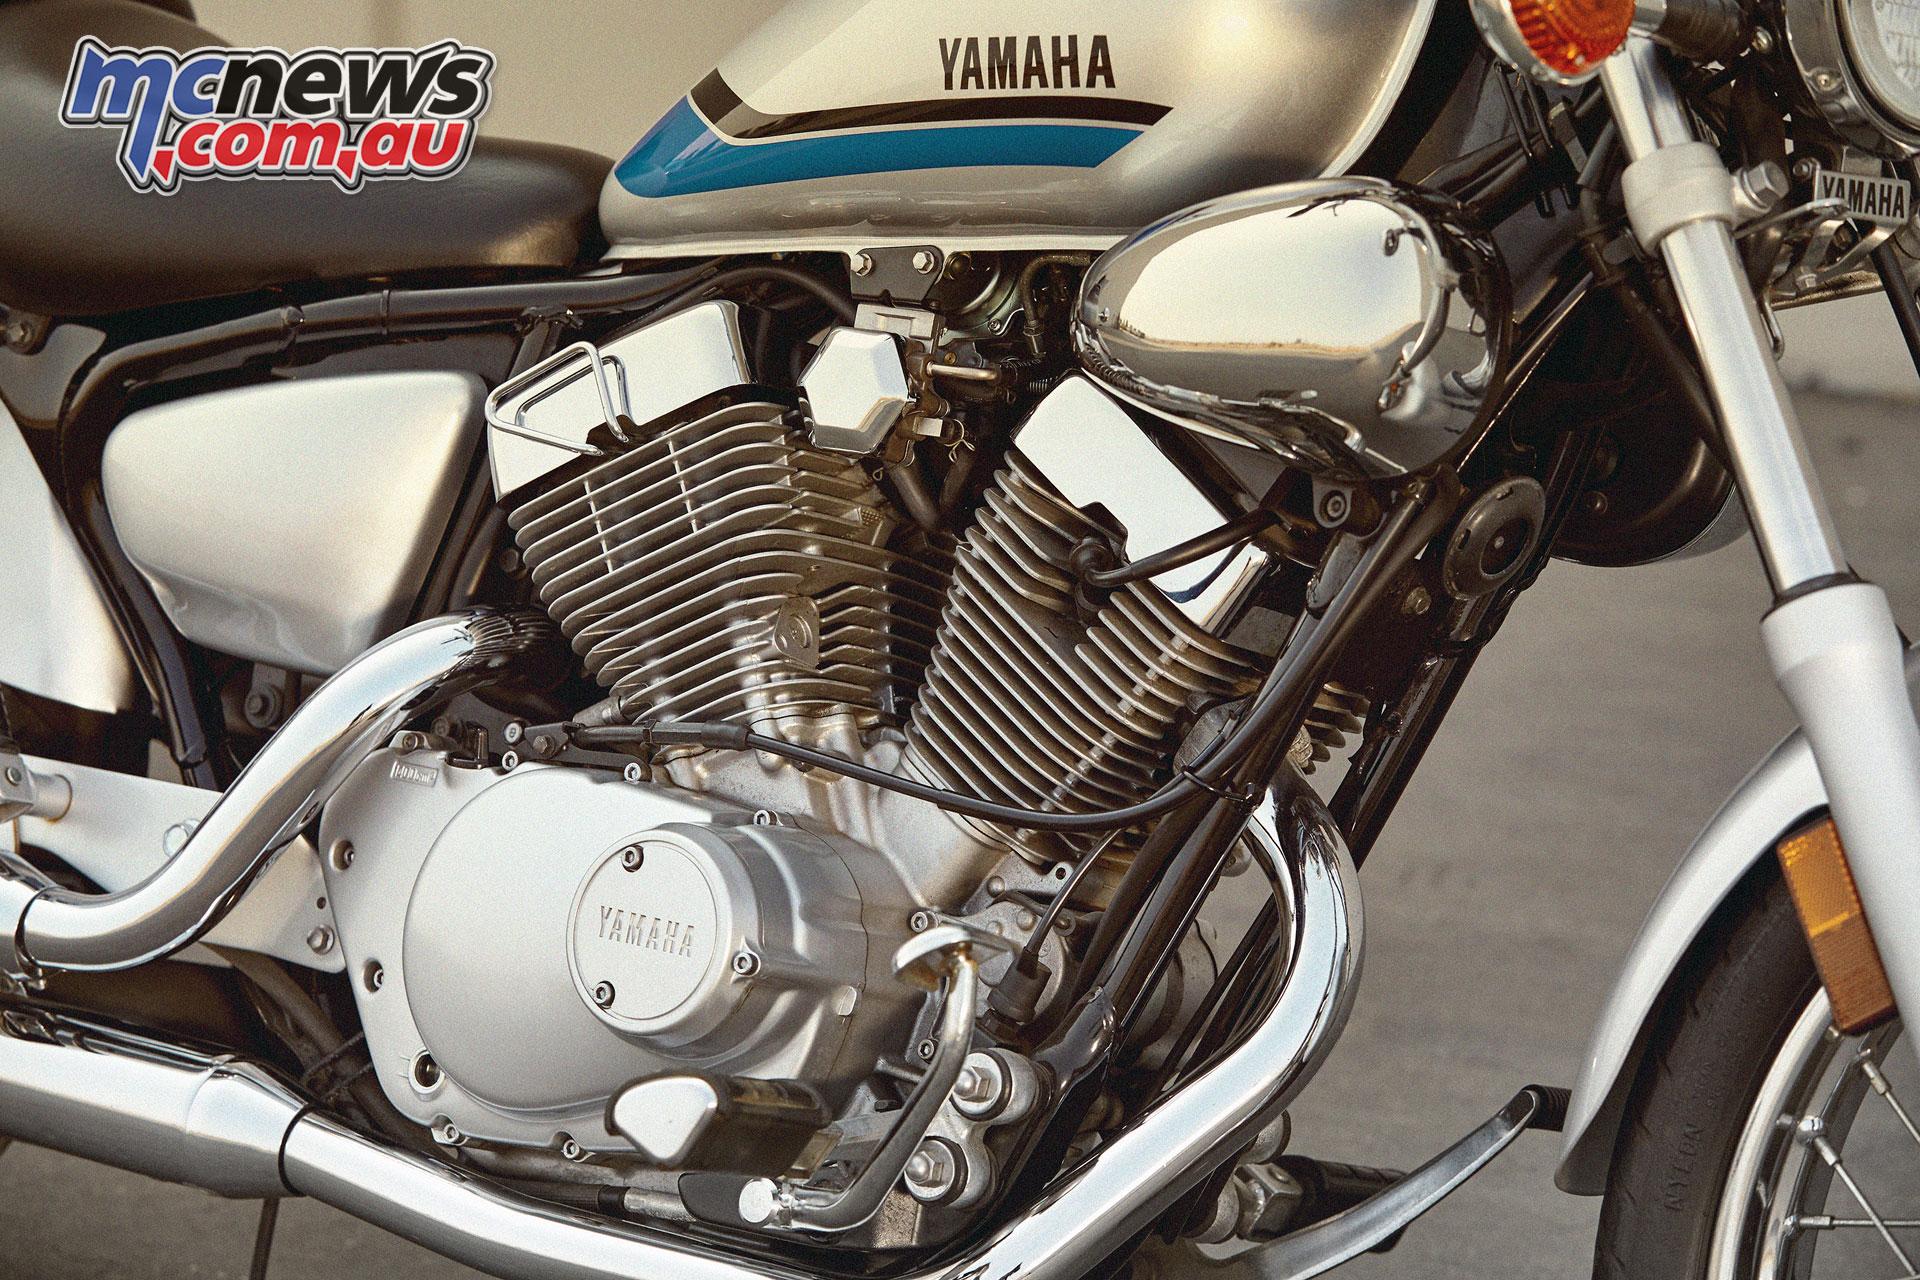 2019 Yamaha XV250 arrives at $6799 | MCNews com au